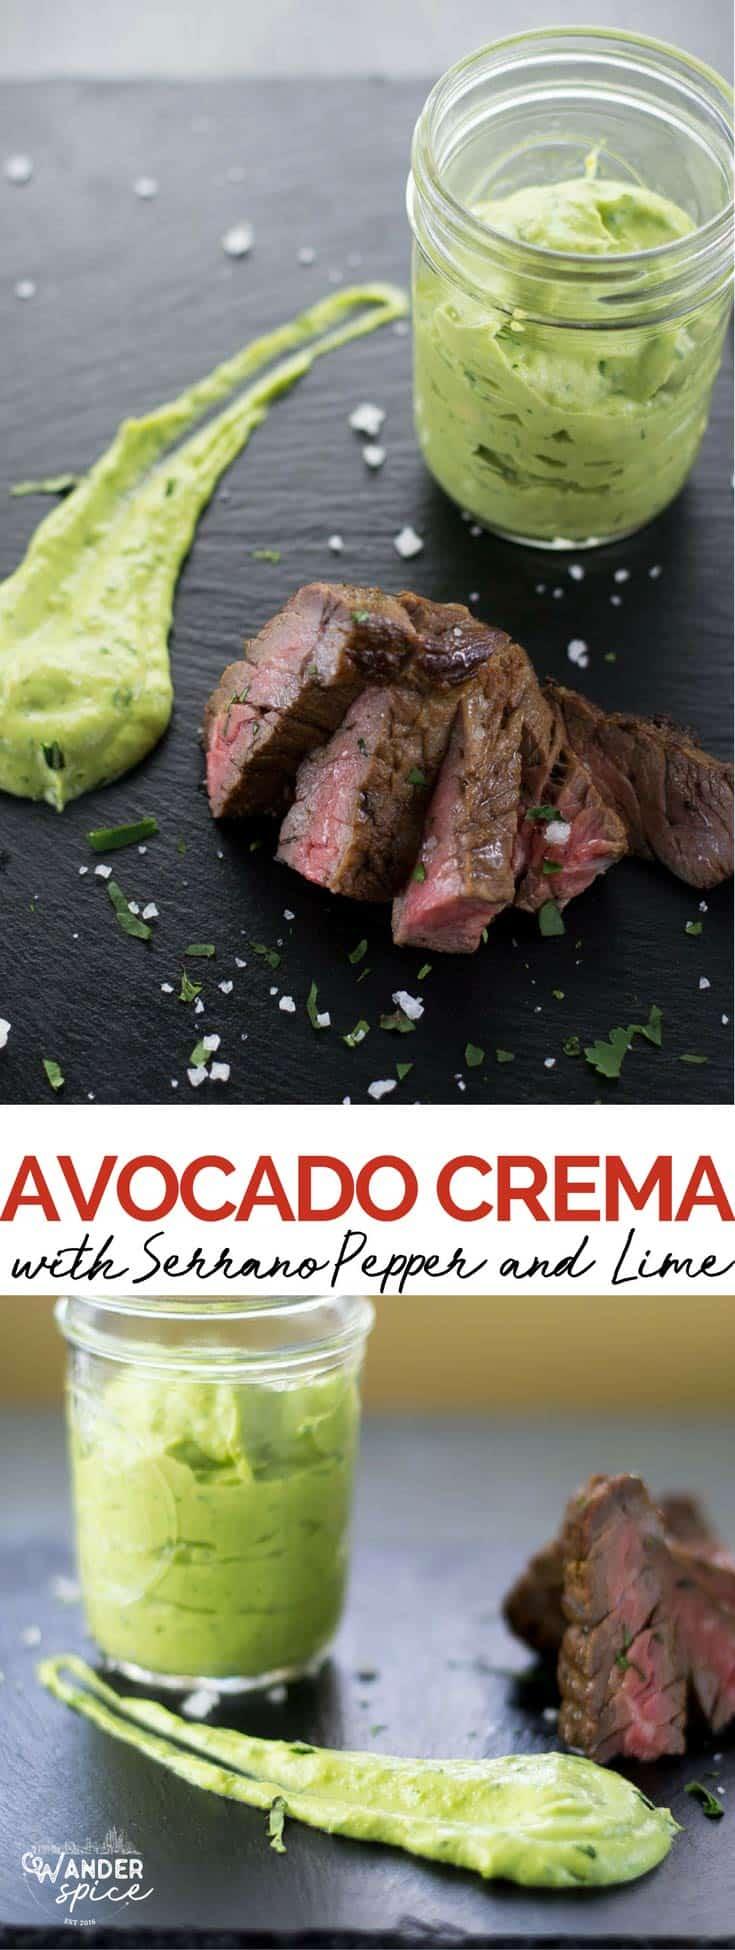 Avocado Cream Recipe. Fish Taco Sauce. Mexican Dipping Sauce that's Healthy